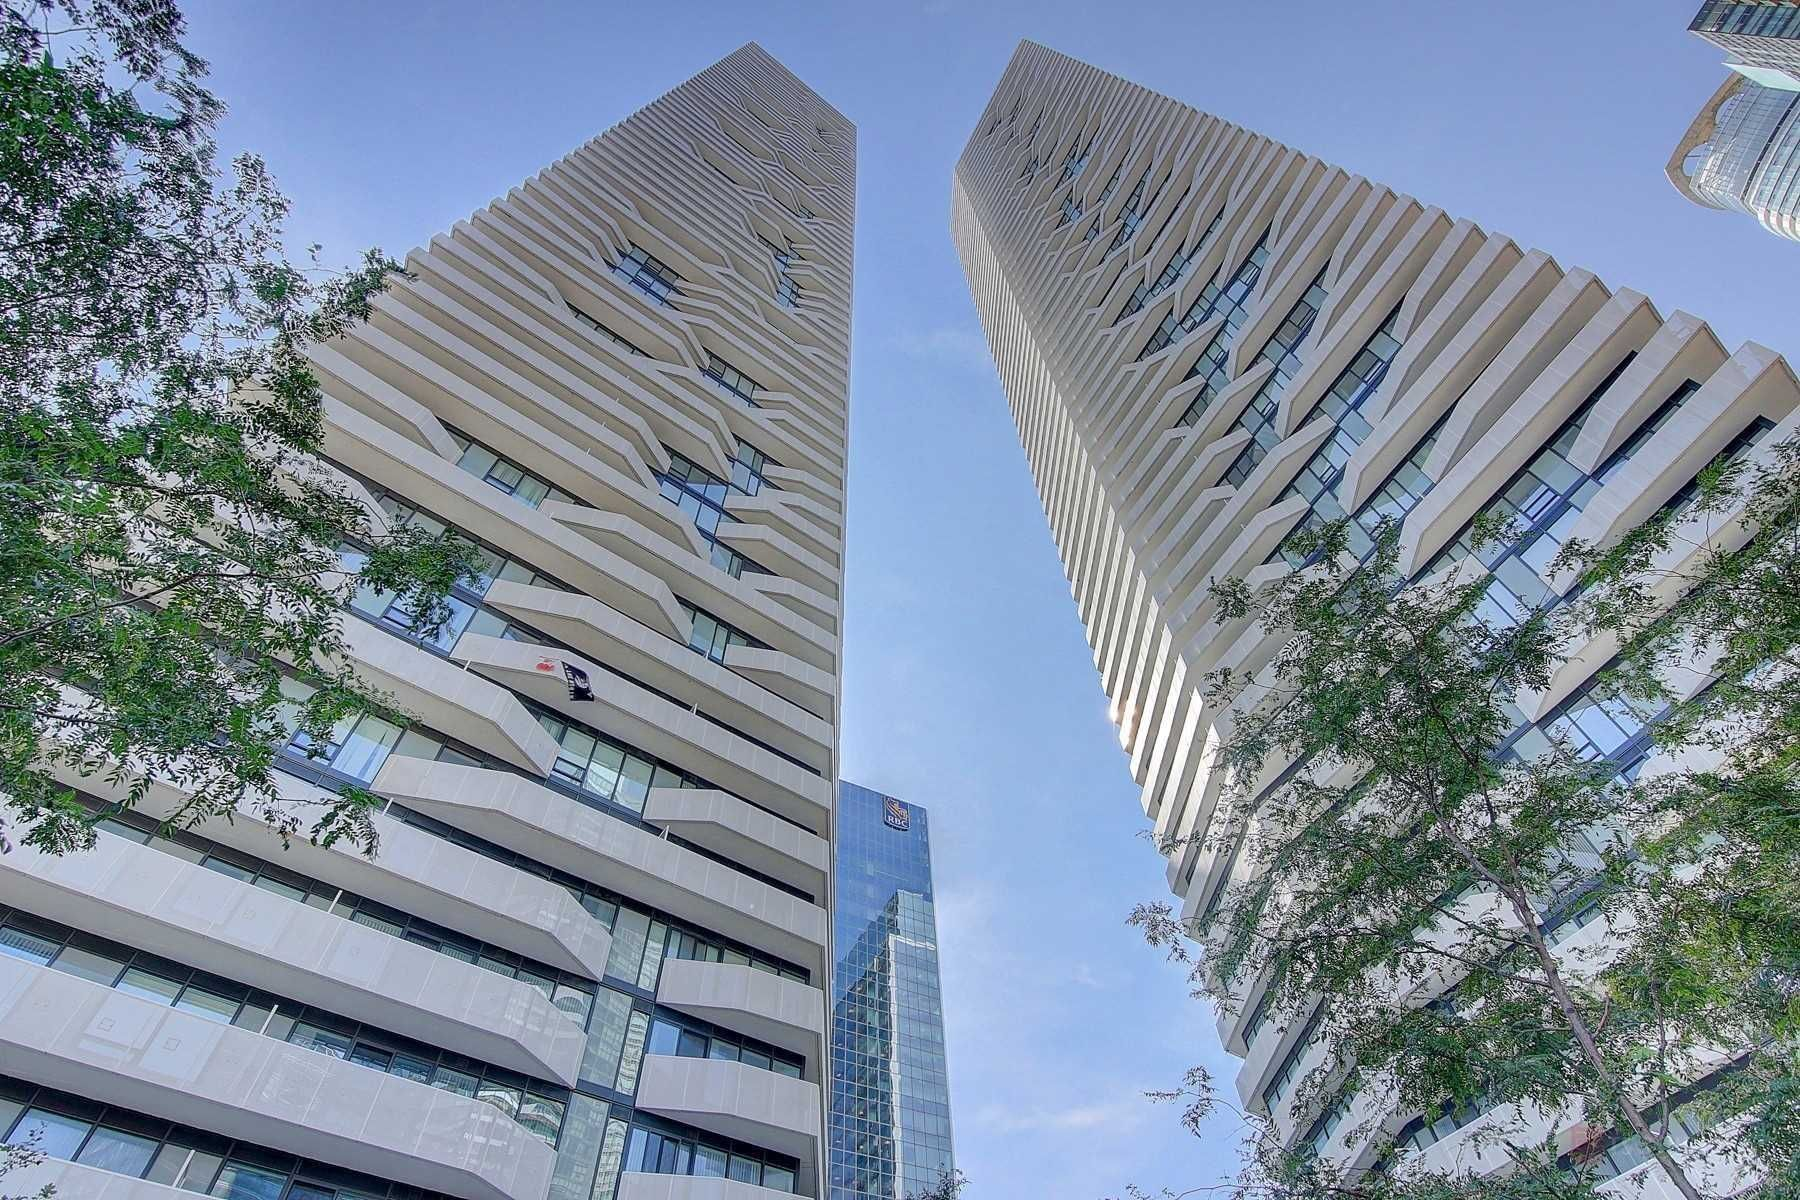 Main Photo: 1401 100 Harbour Street in Toronto: Waterfront Communities C1 Condo for lease (Toronto C01)  : MLS®# C4977762